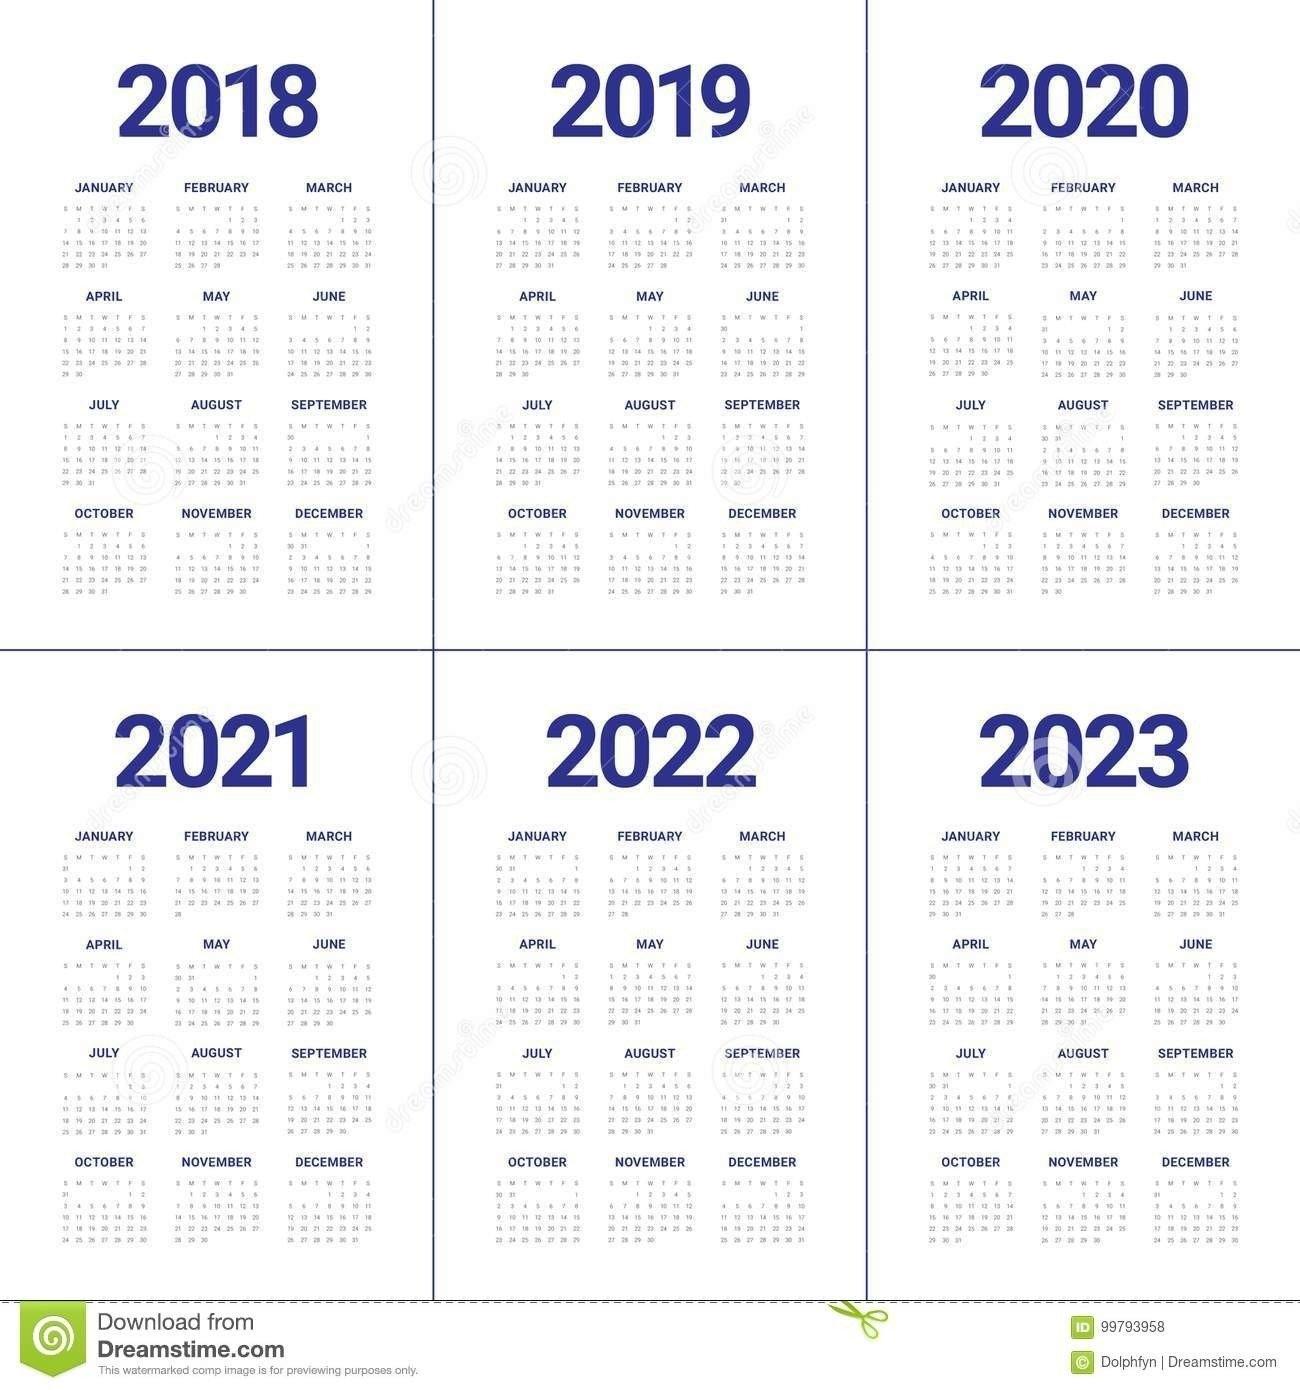 3 Year Calendar 2021 To 2023   Calendar Template Printable with Three Year Calendar 2019 2021 2021 Calendar Pedia Image